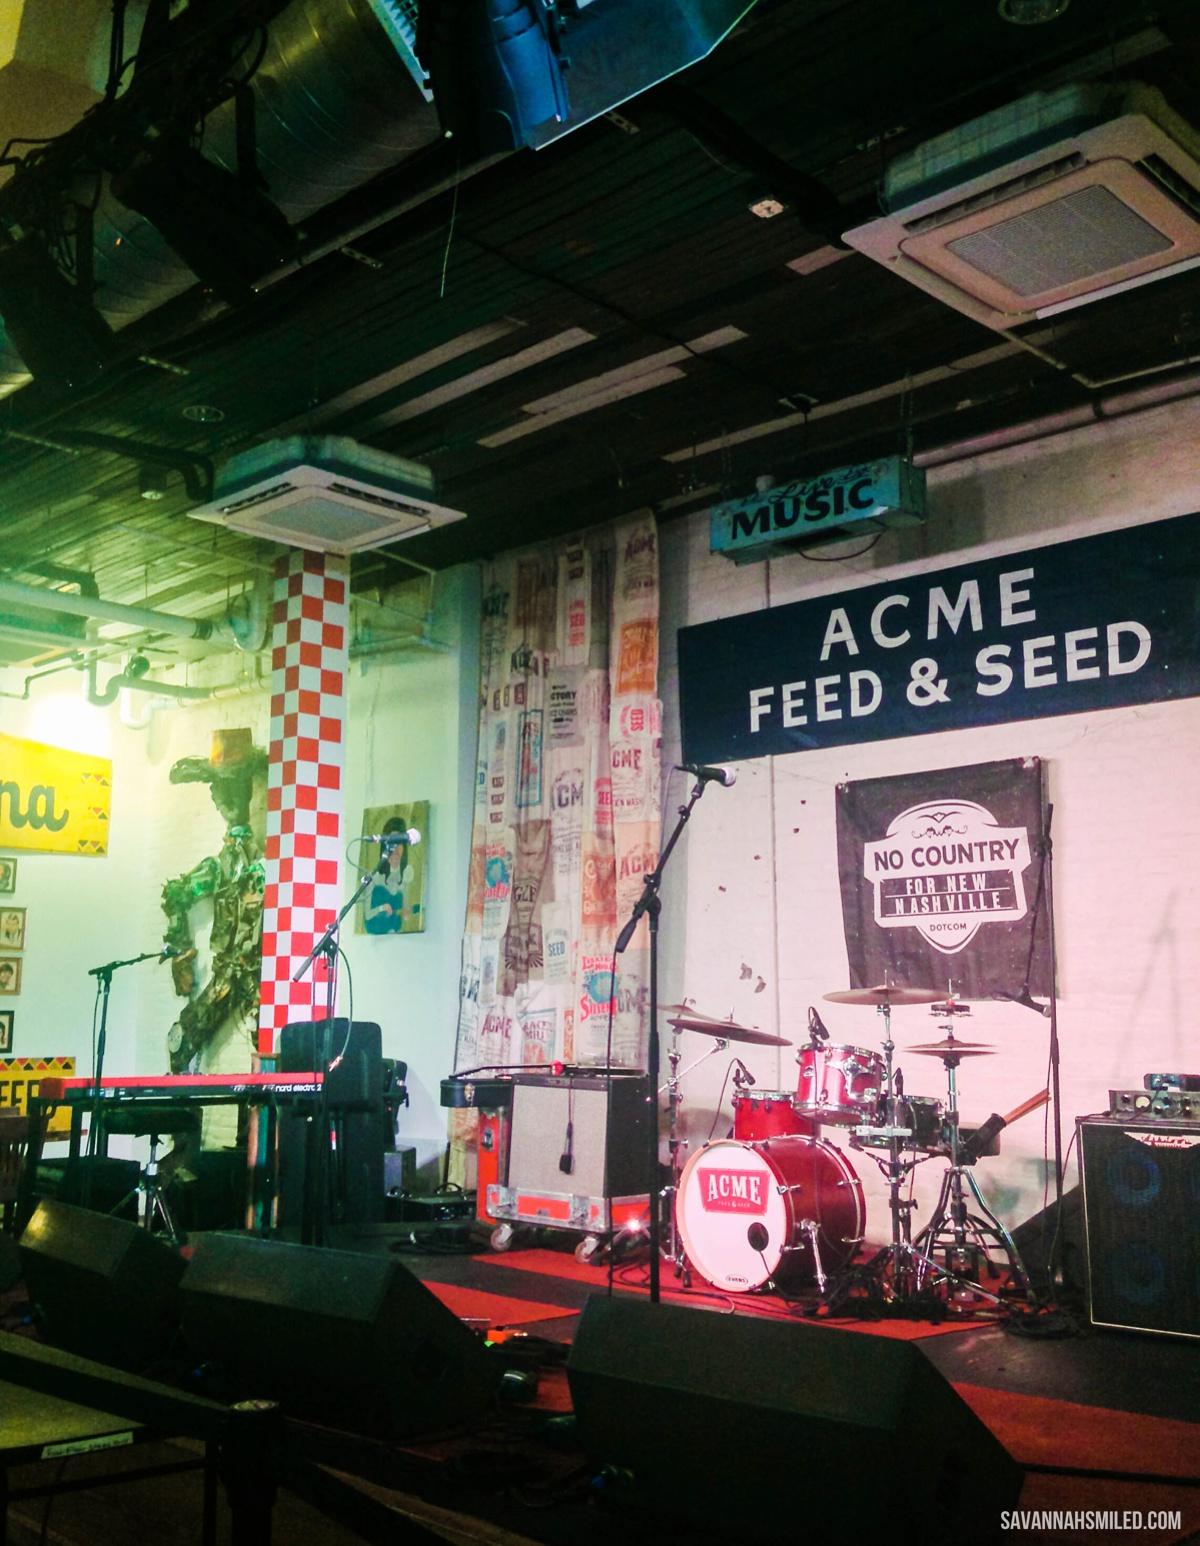 acme-feed-seed-broadway-nashville-3.jpg